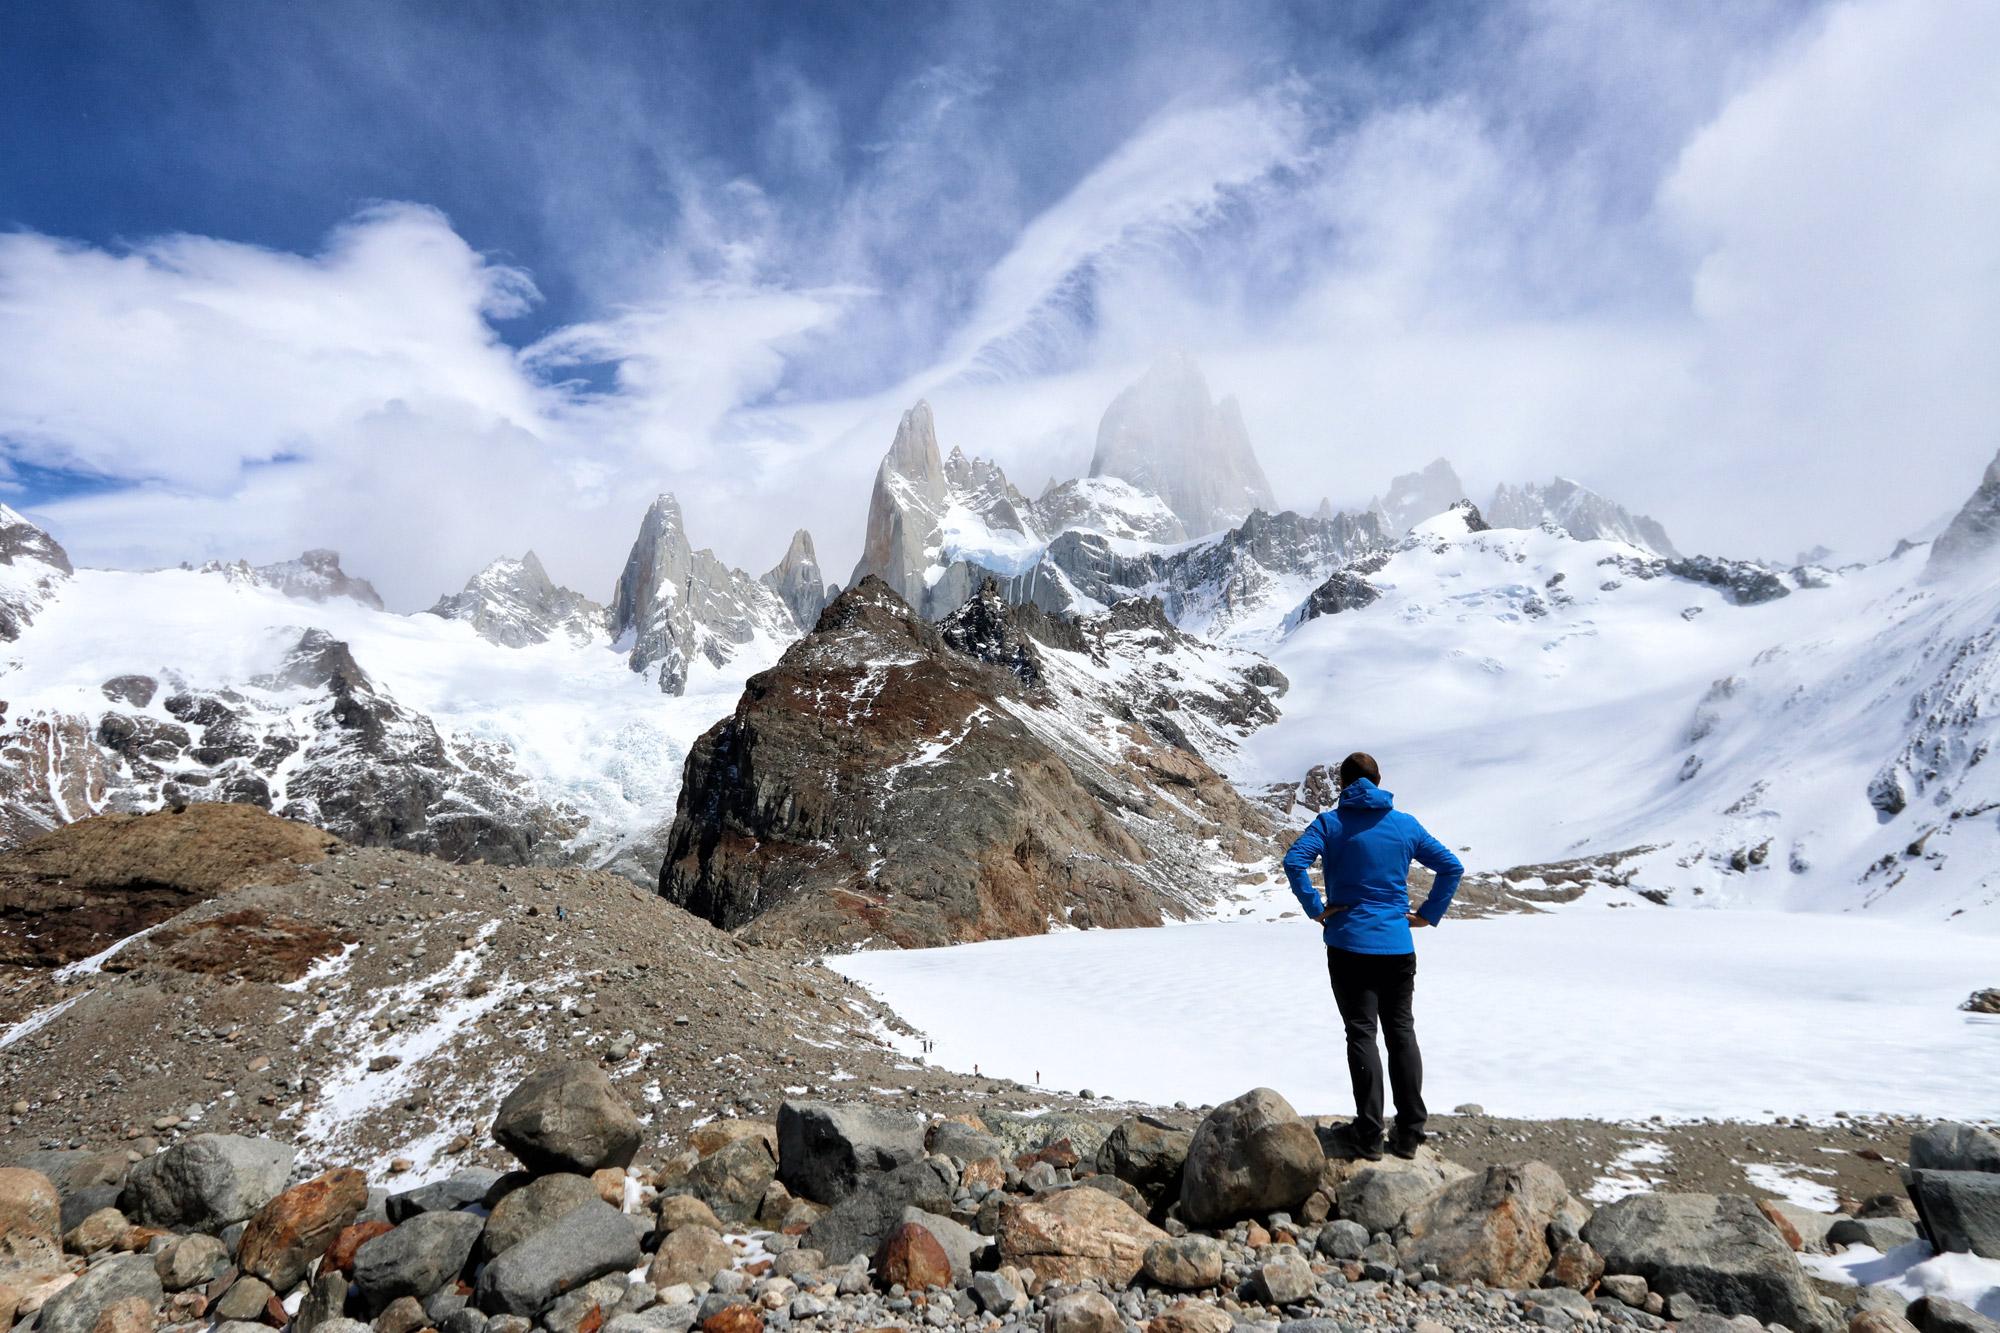 Wandeling: Laguna de los Tres - Argentinië